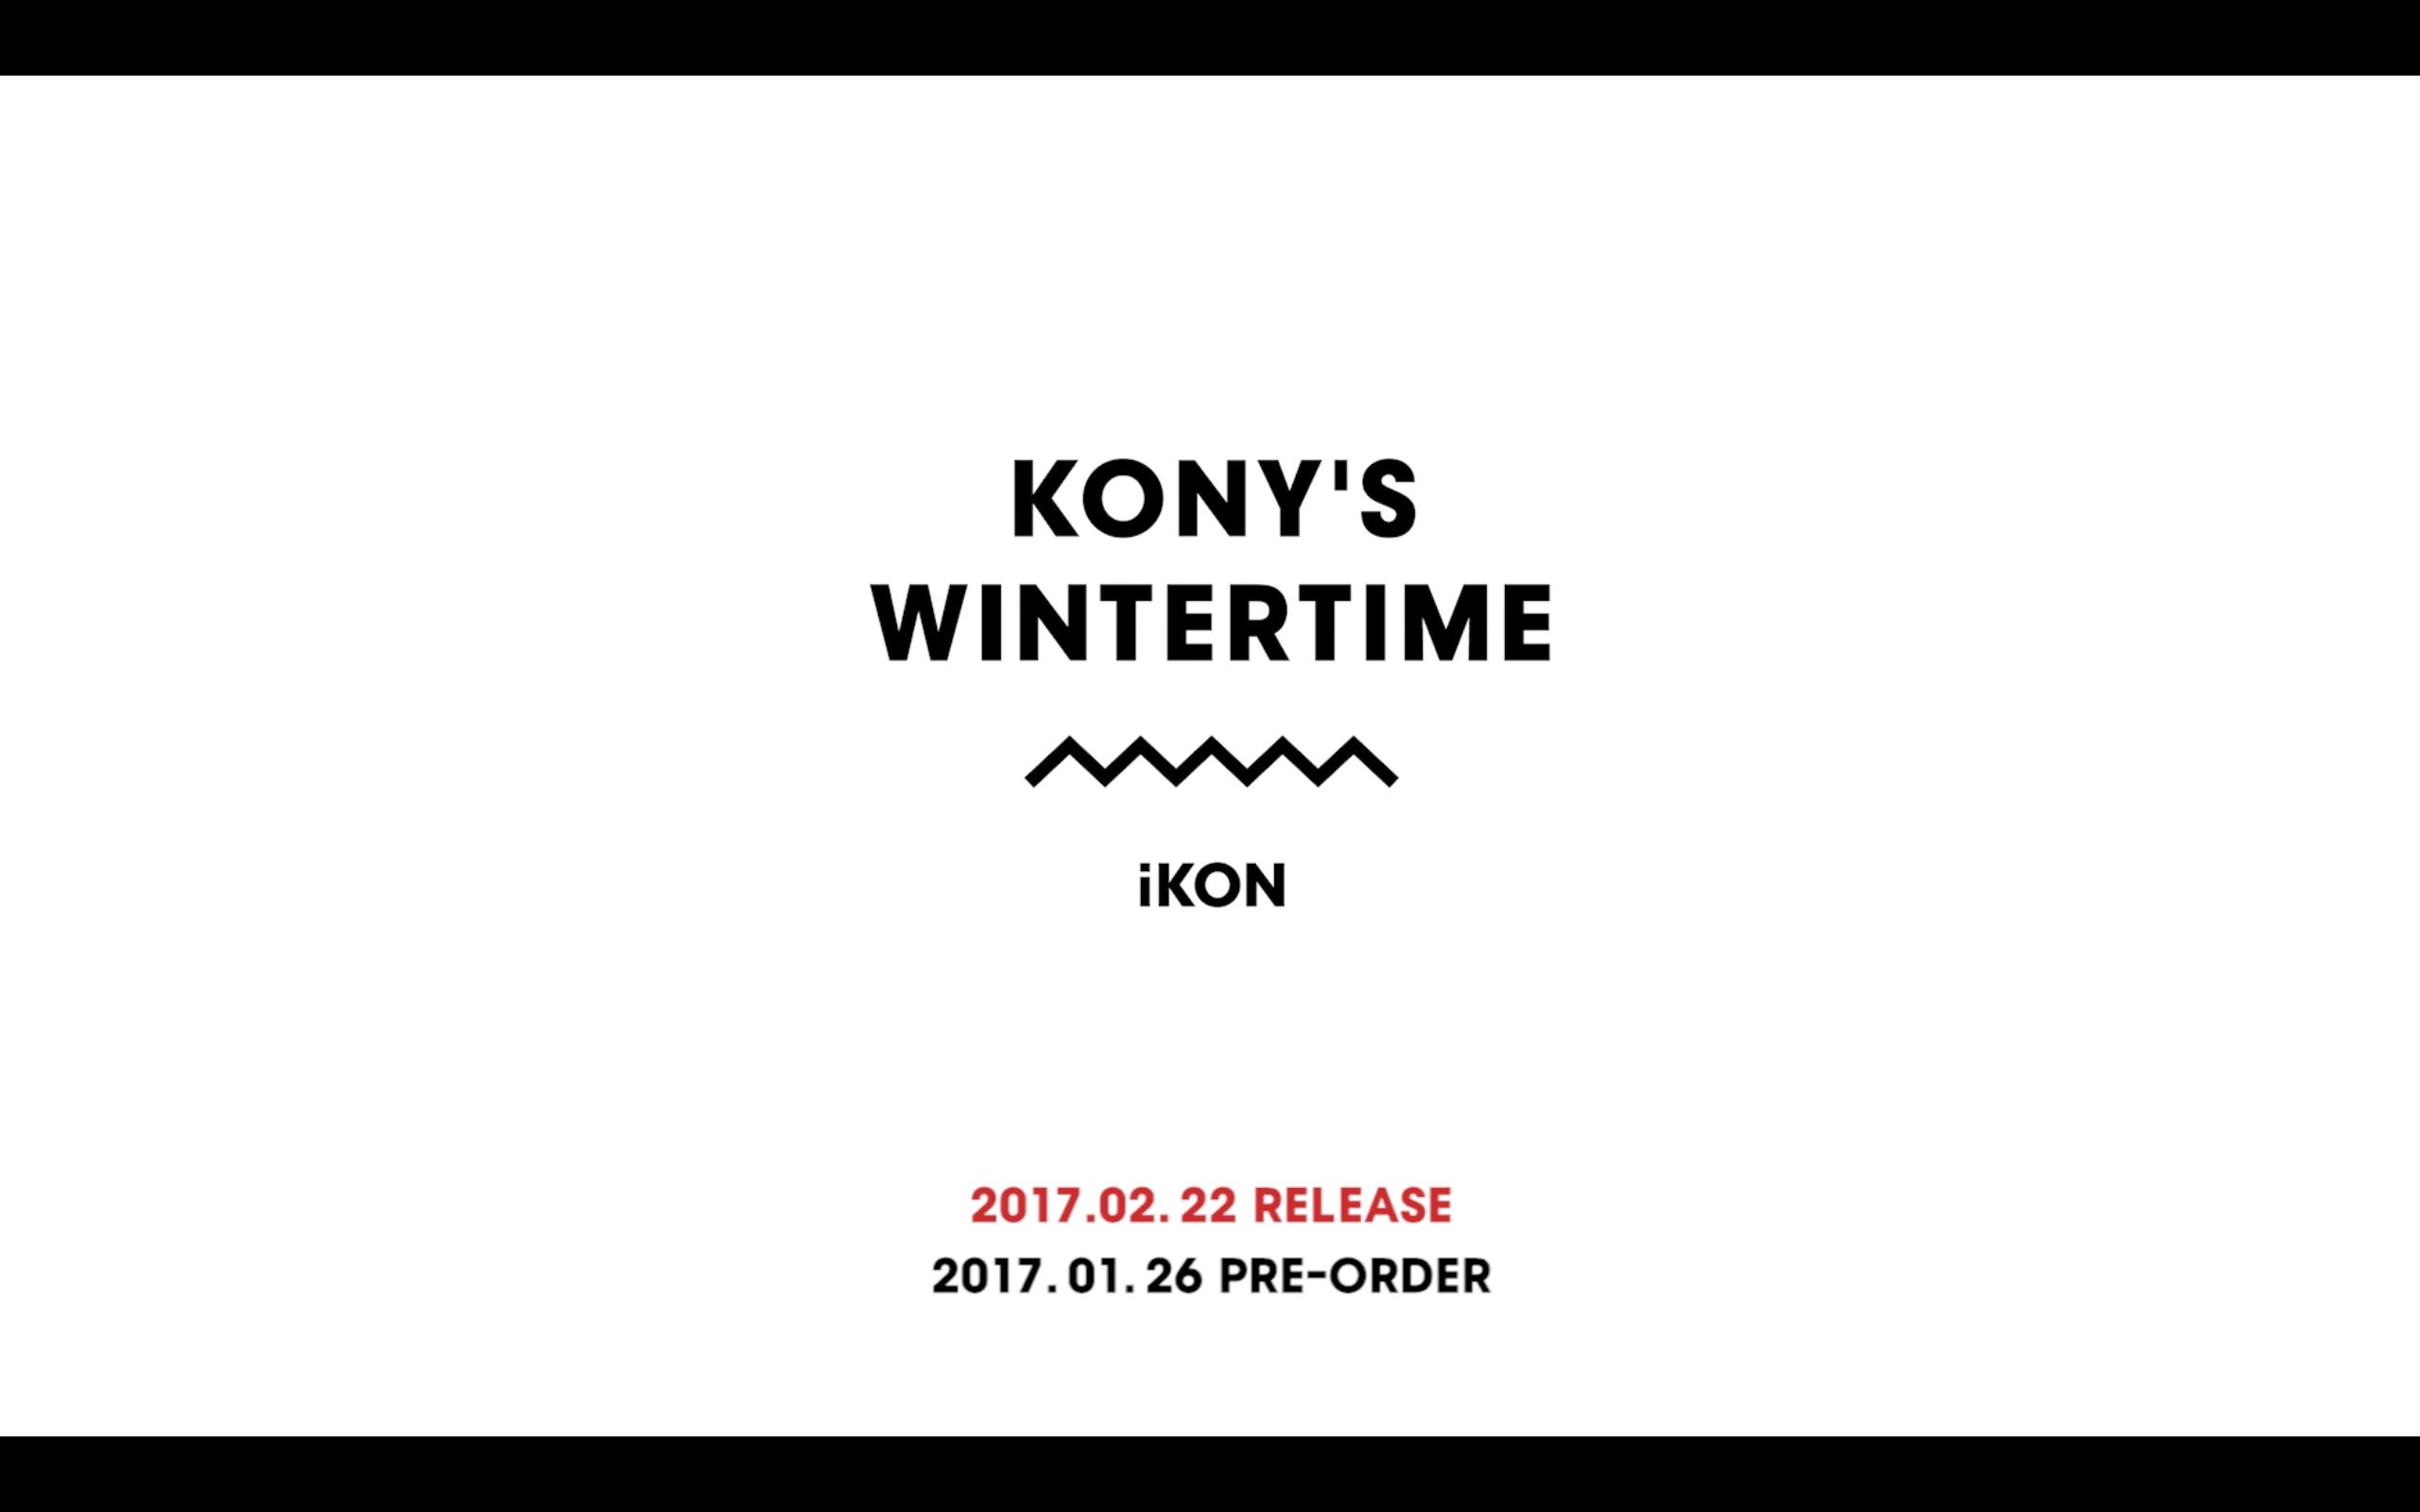 iKON | KONY'S WINTERTIME [LIMITED EDITION]